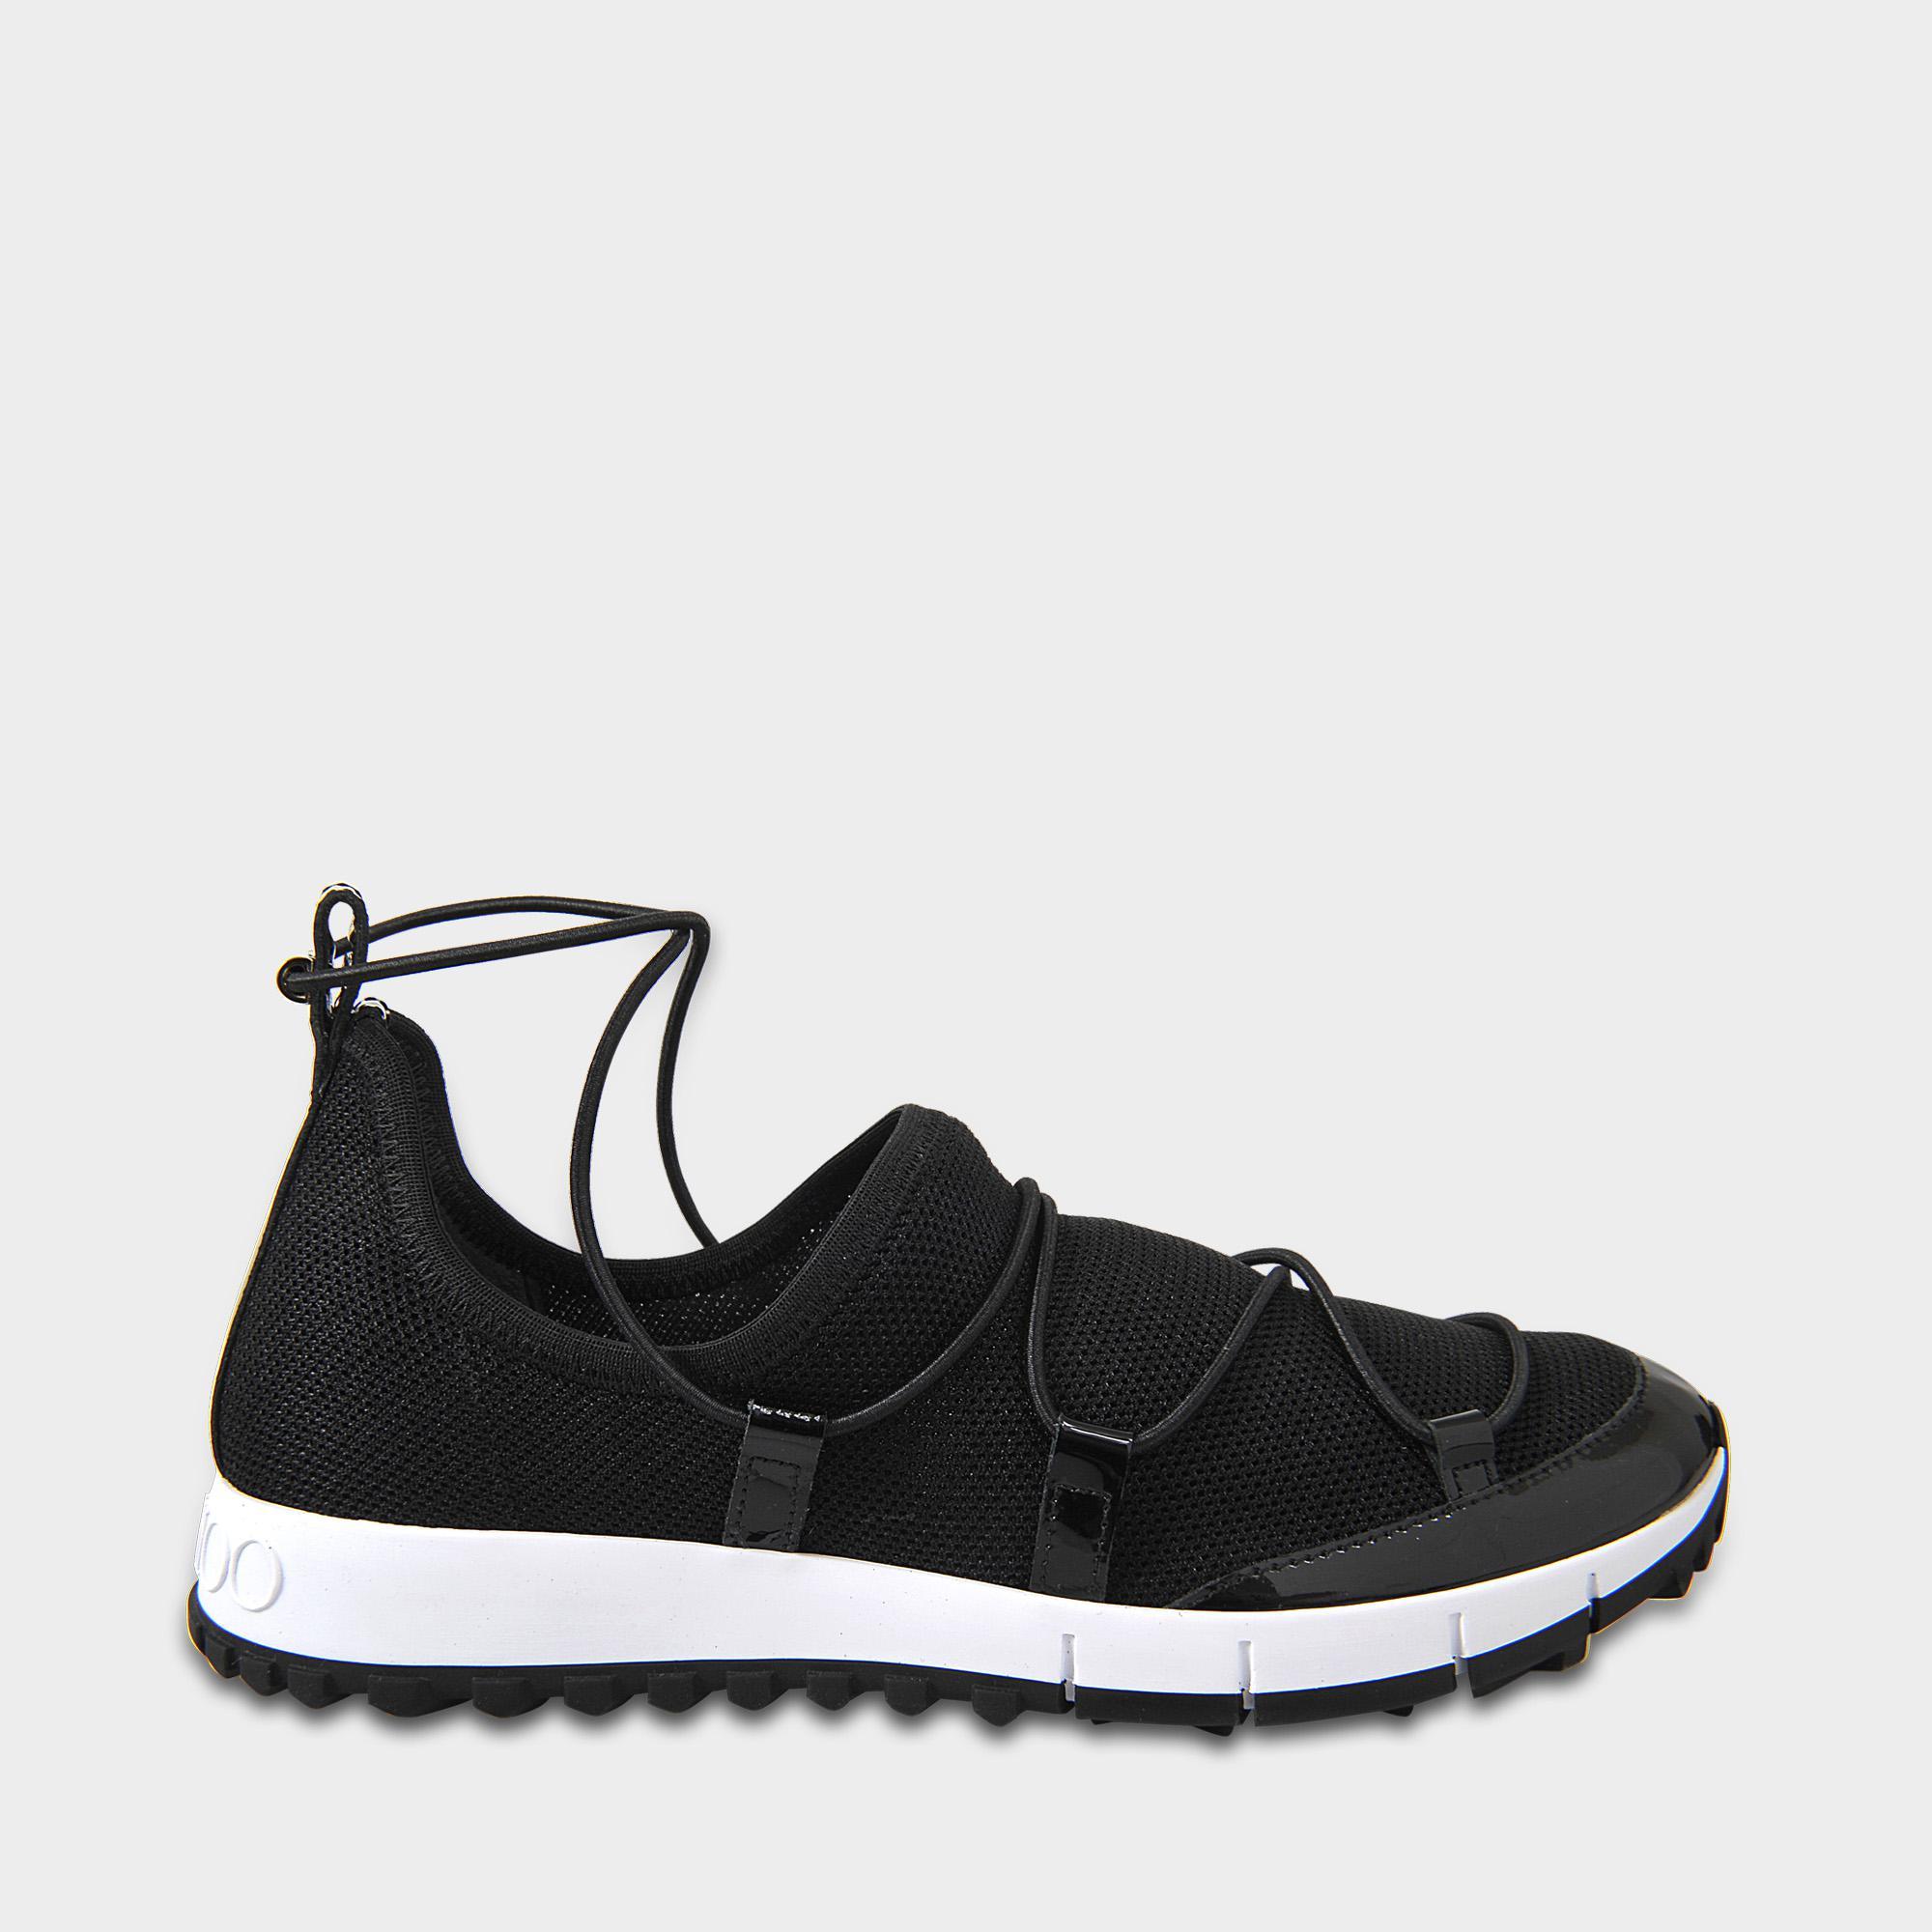 Jimmy Choo Lace 'andrea' Sneakers in Sterling Silver (Black)